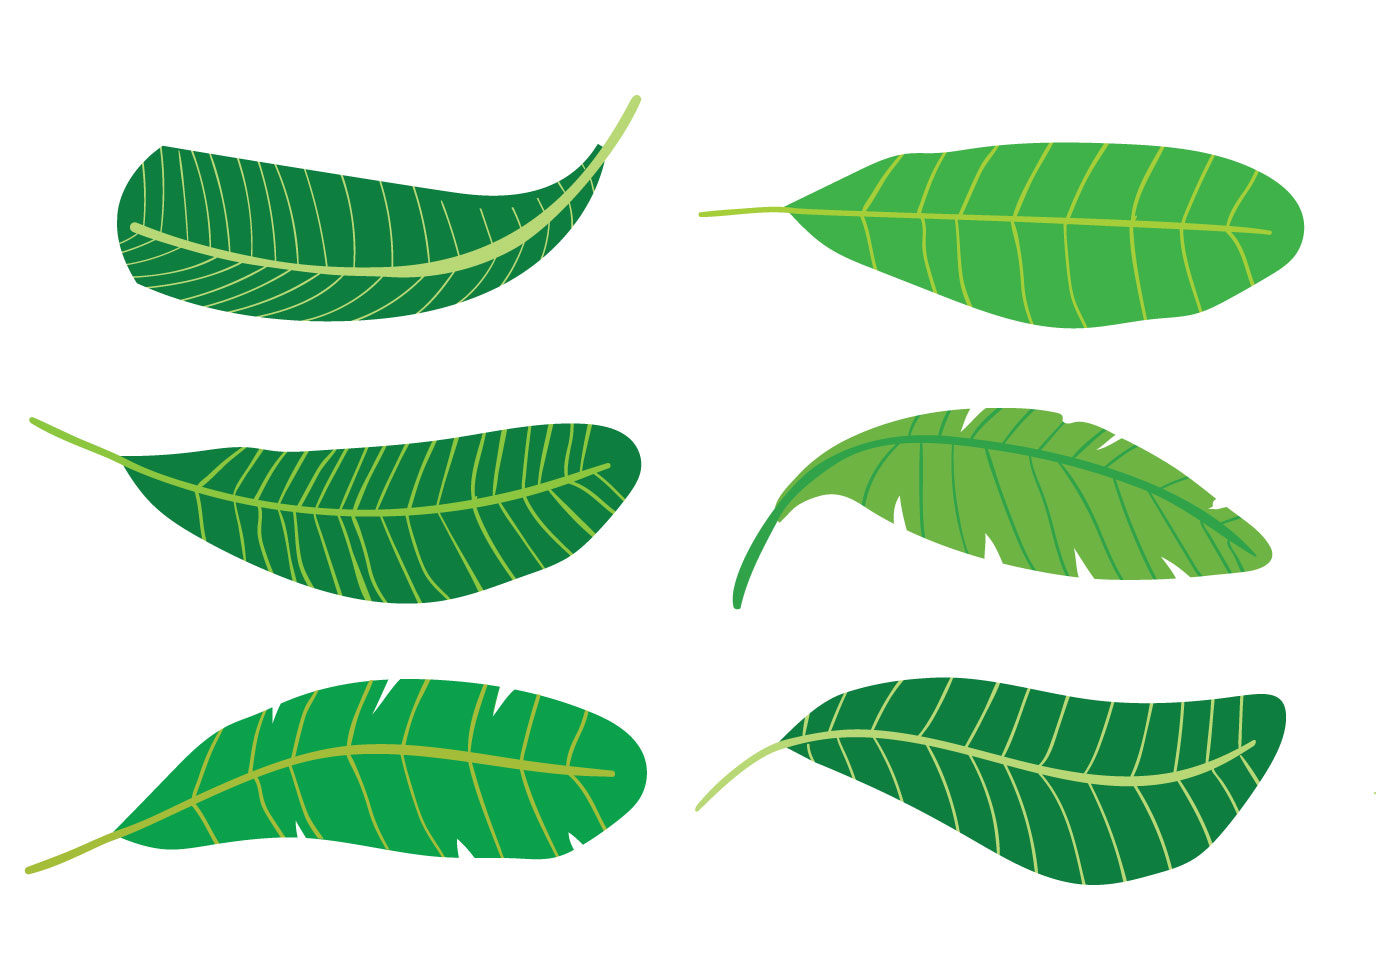 Banana Leaf Vectors - Download Free Vector Art, Stock ...